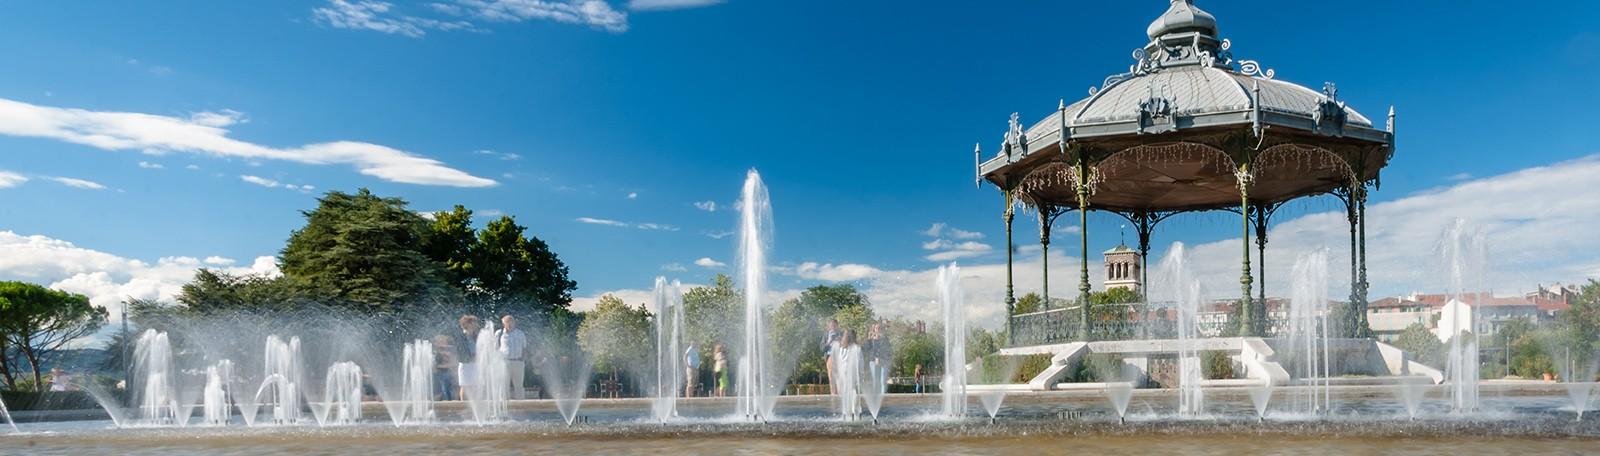 Car park Faventines - Park in Valence | Q-Park